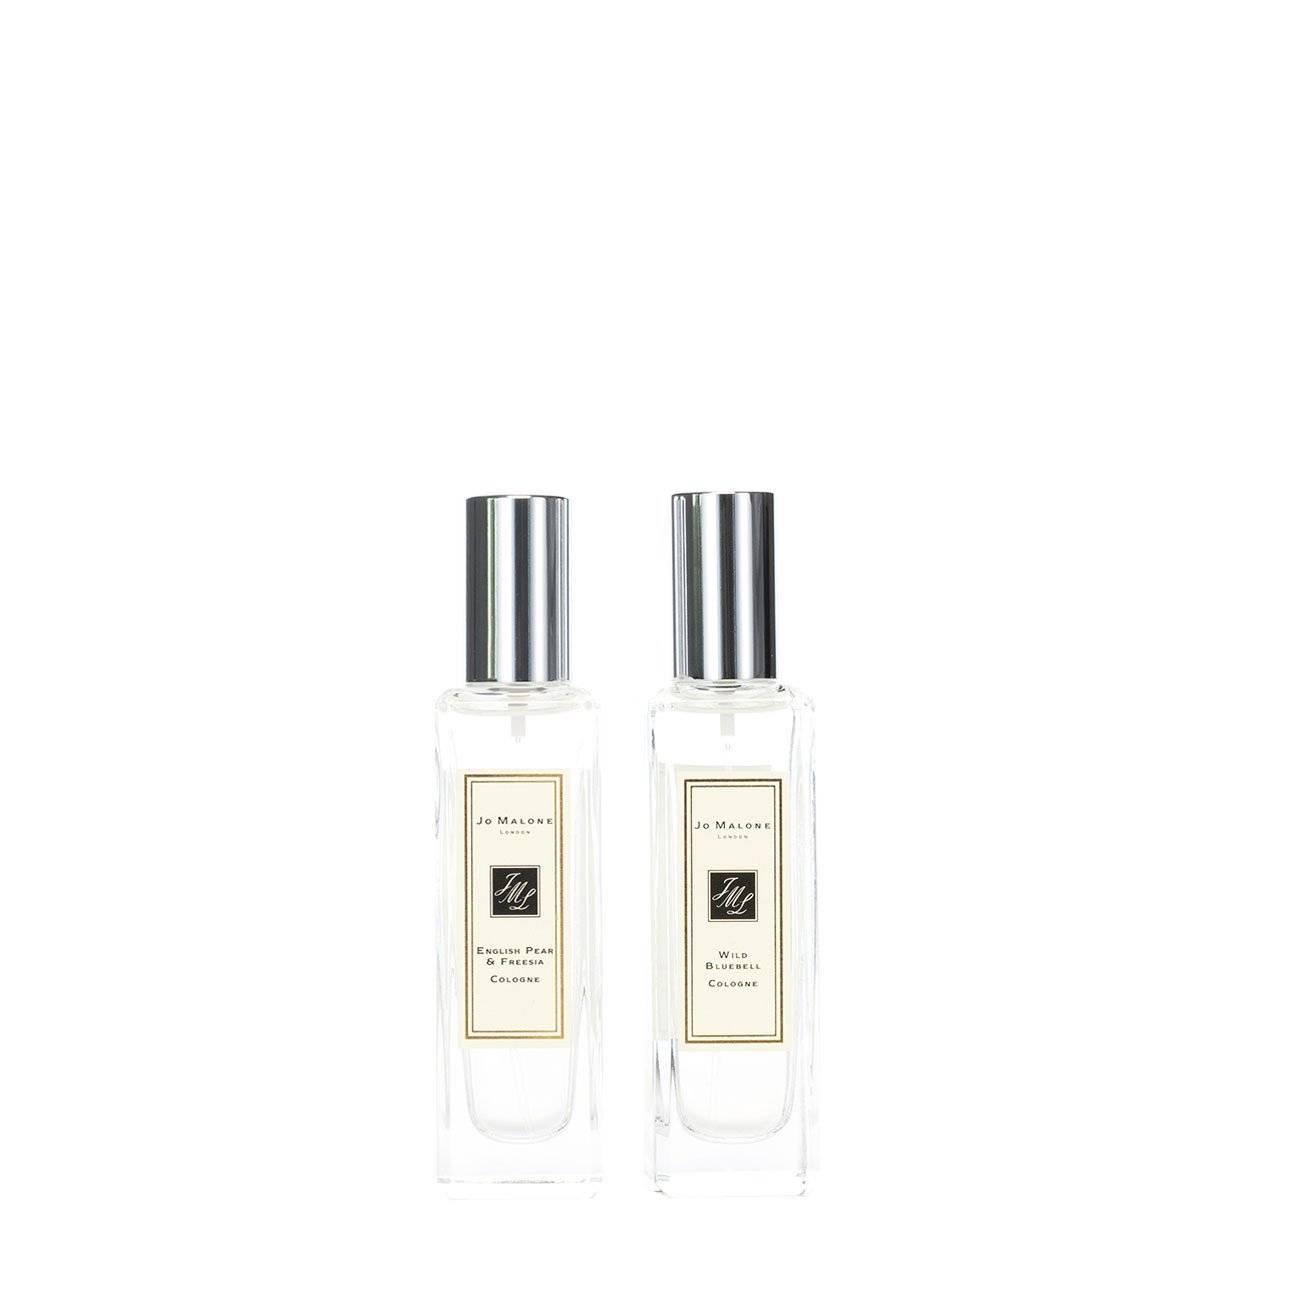 Fragrance Combining Duo Set 60ml - Jo Malone London